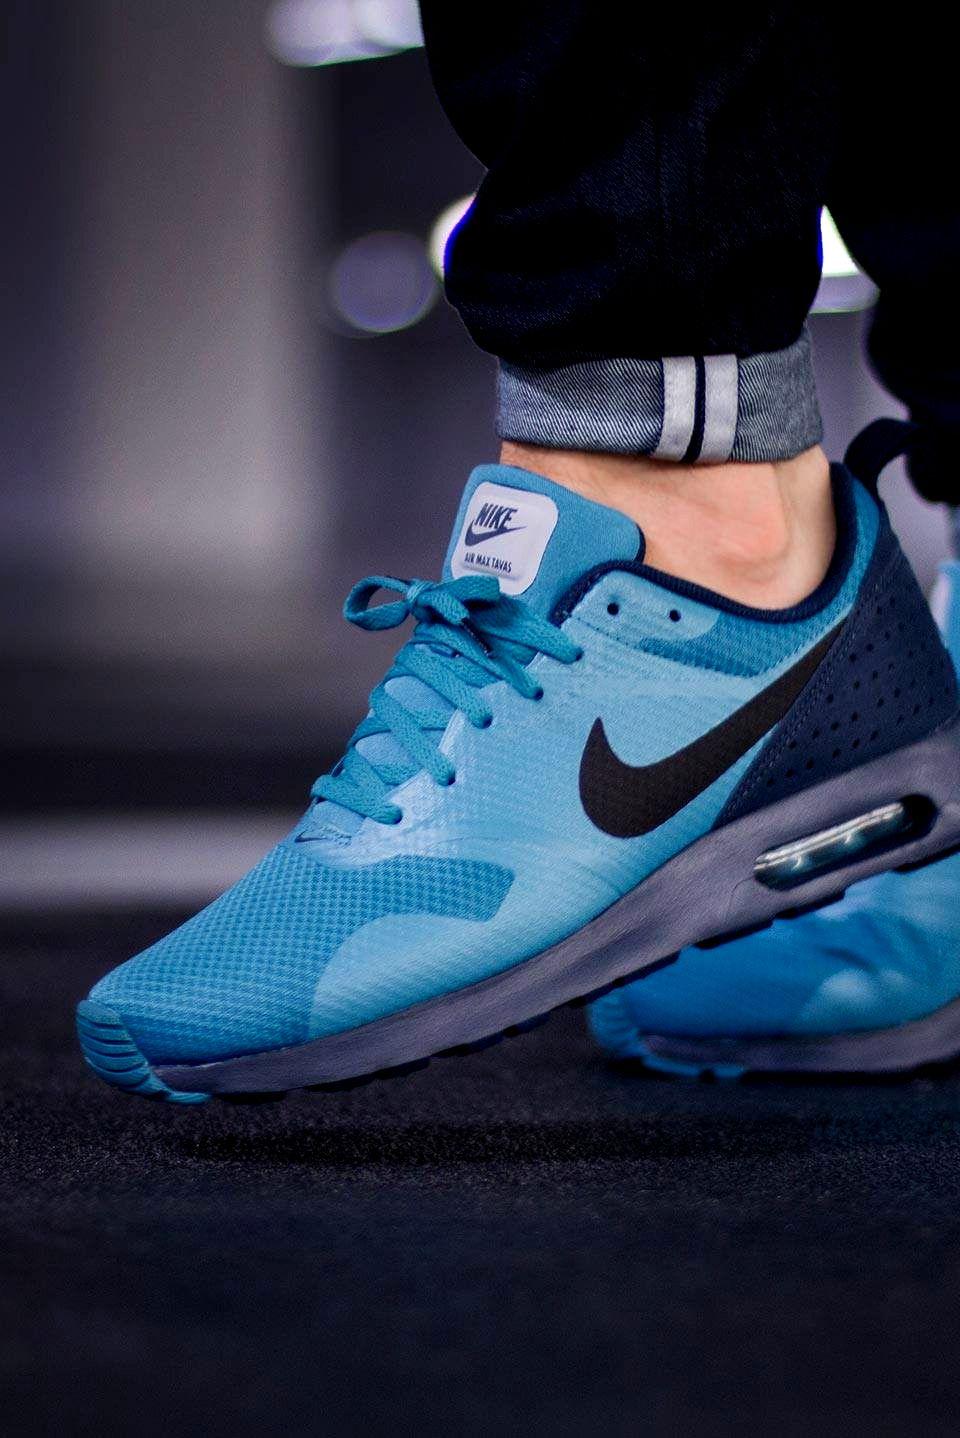 Nike Air Max Tavas 'Stratus Blue' (via Kicks ) in